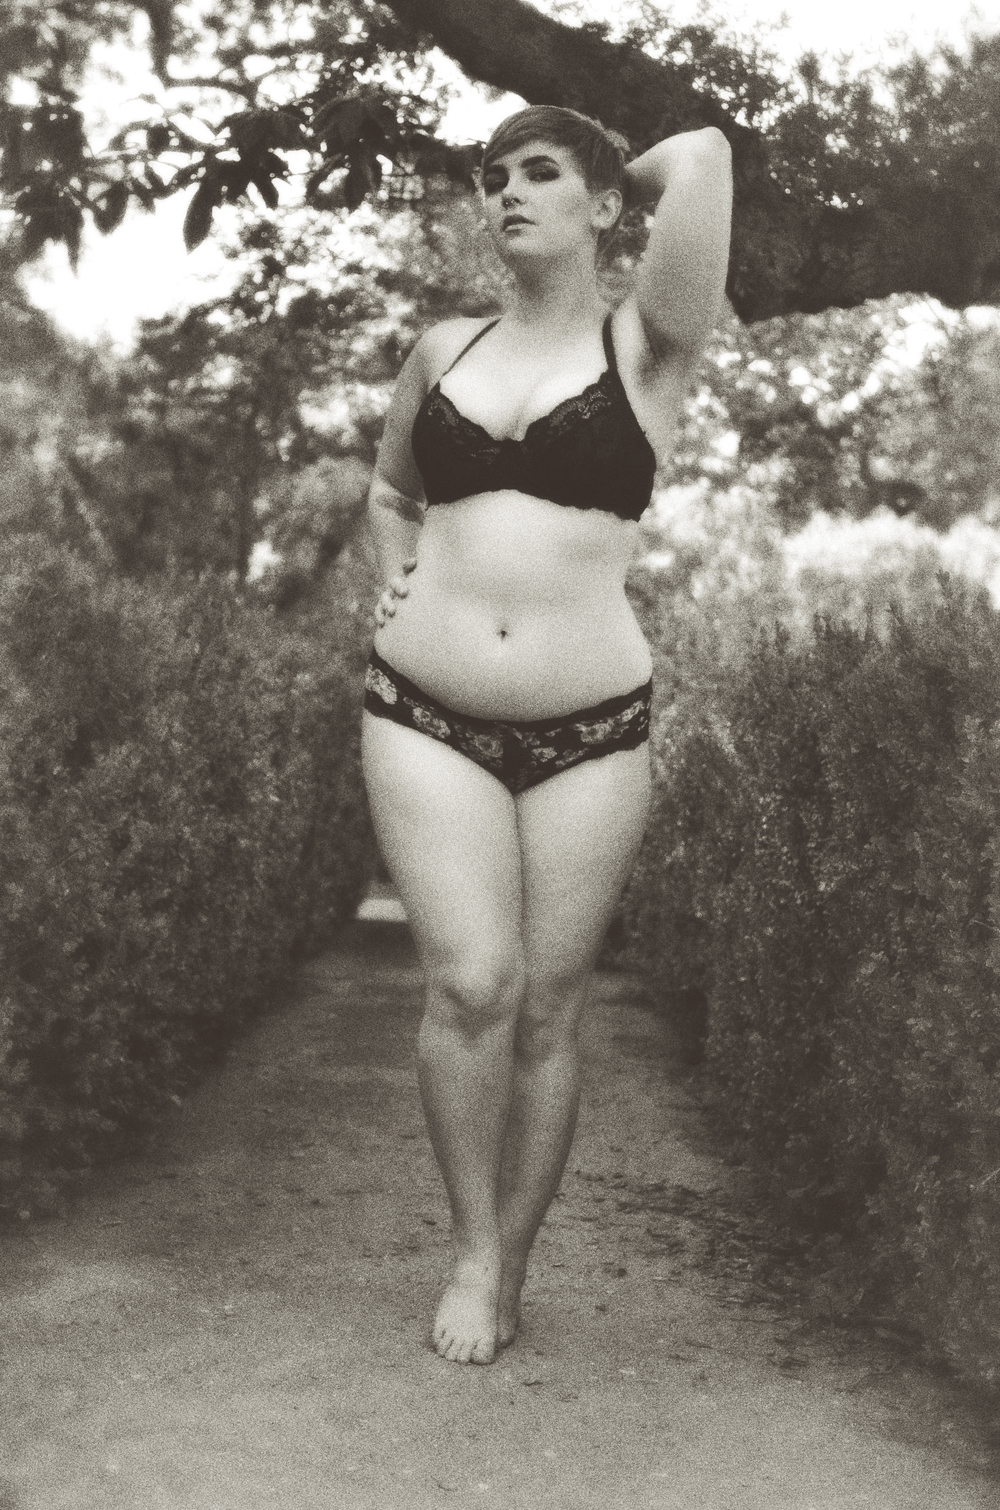 Ivory Rose Boudoir - Tessa Boudoir 2015 - Boudoir Photography Los Angeles Santa Barbara Ojai Art Vintage-45.1.jpg